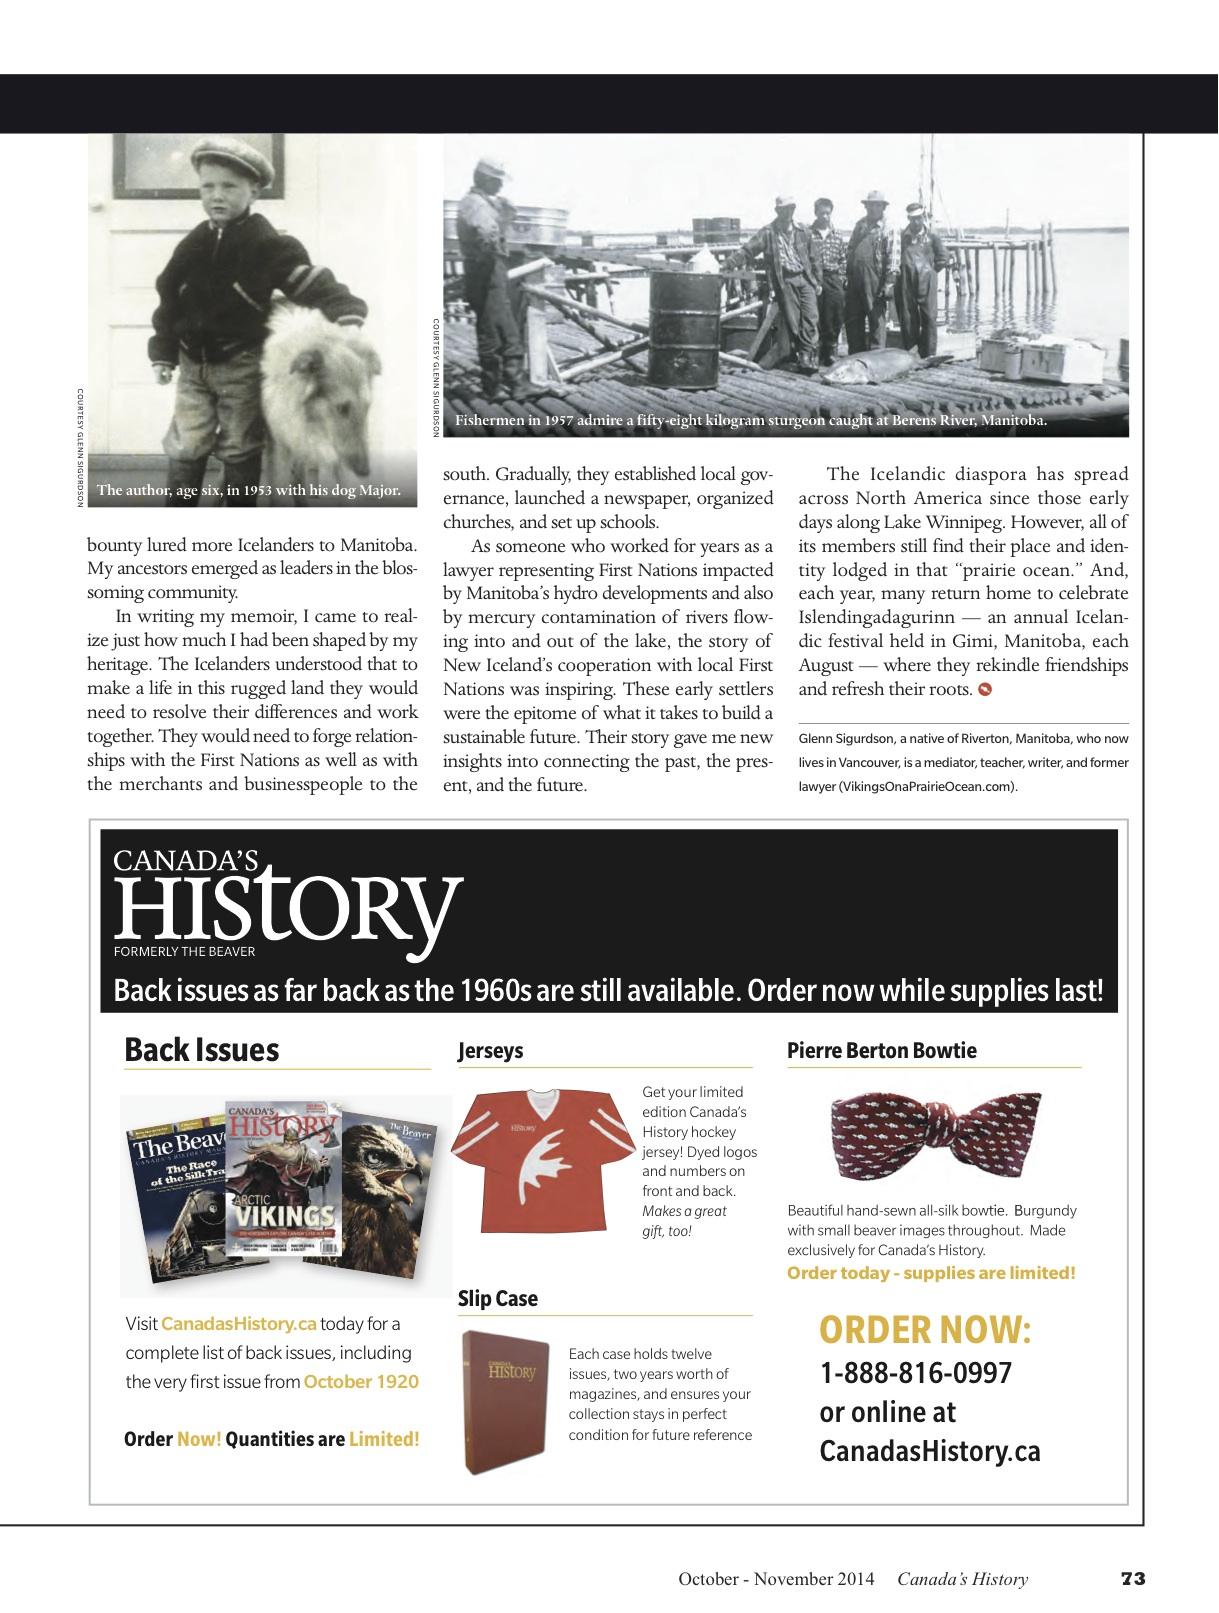 Canada's History_Oct-Nov_2014